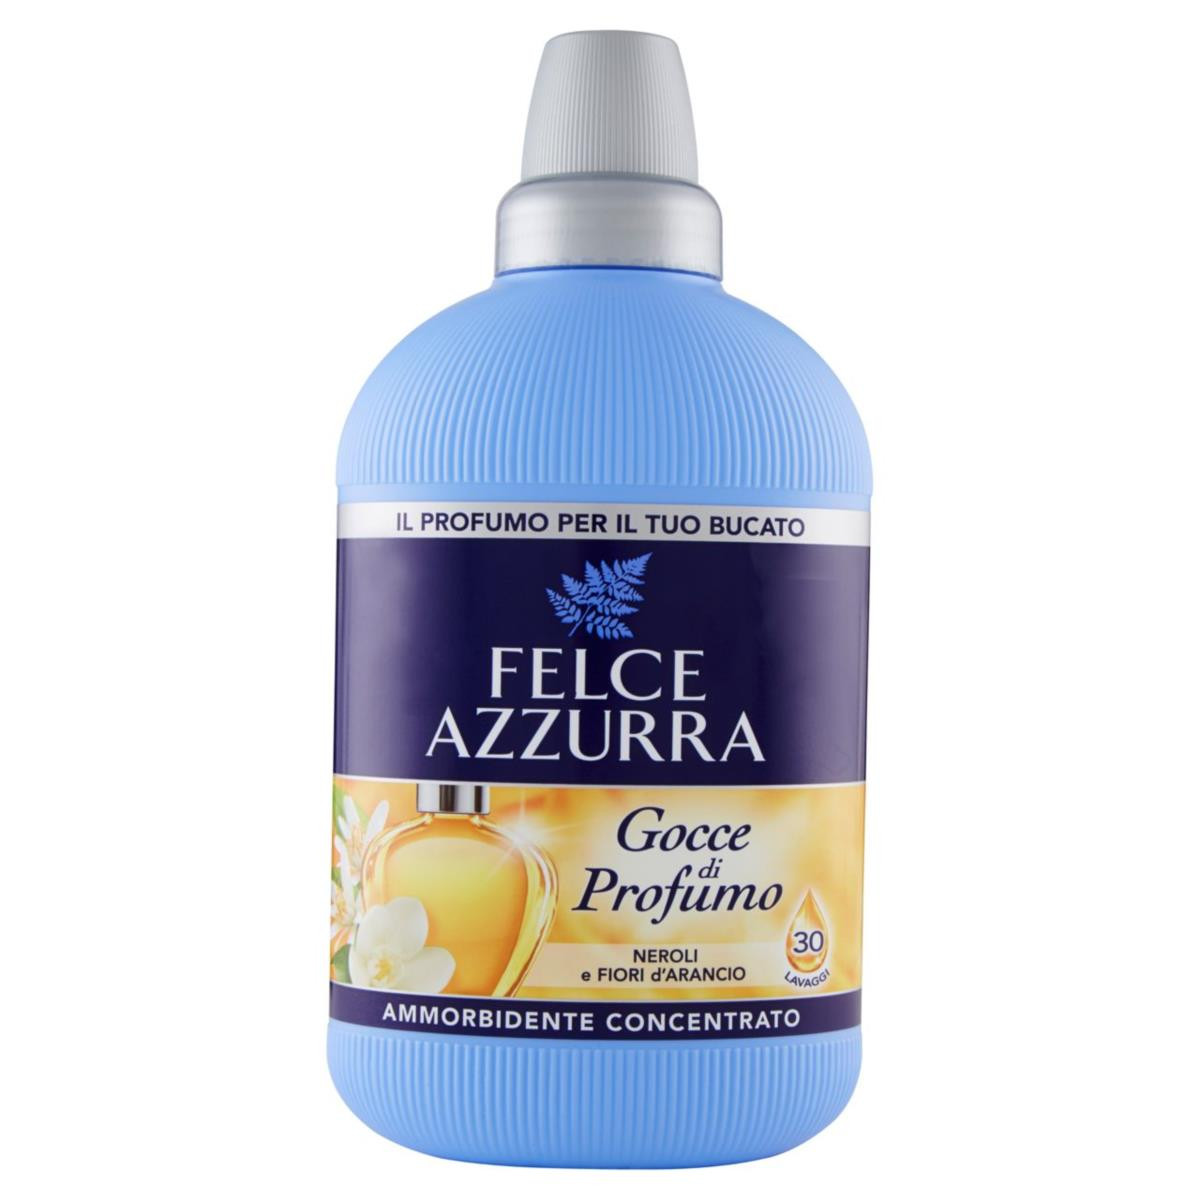 Felce Azzurra Gocce di Profumo Neroli e Fiori d´Arancio aviváž koncentrát 750 ml.